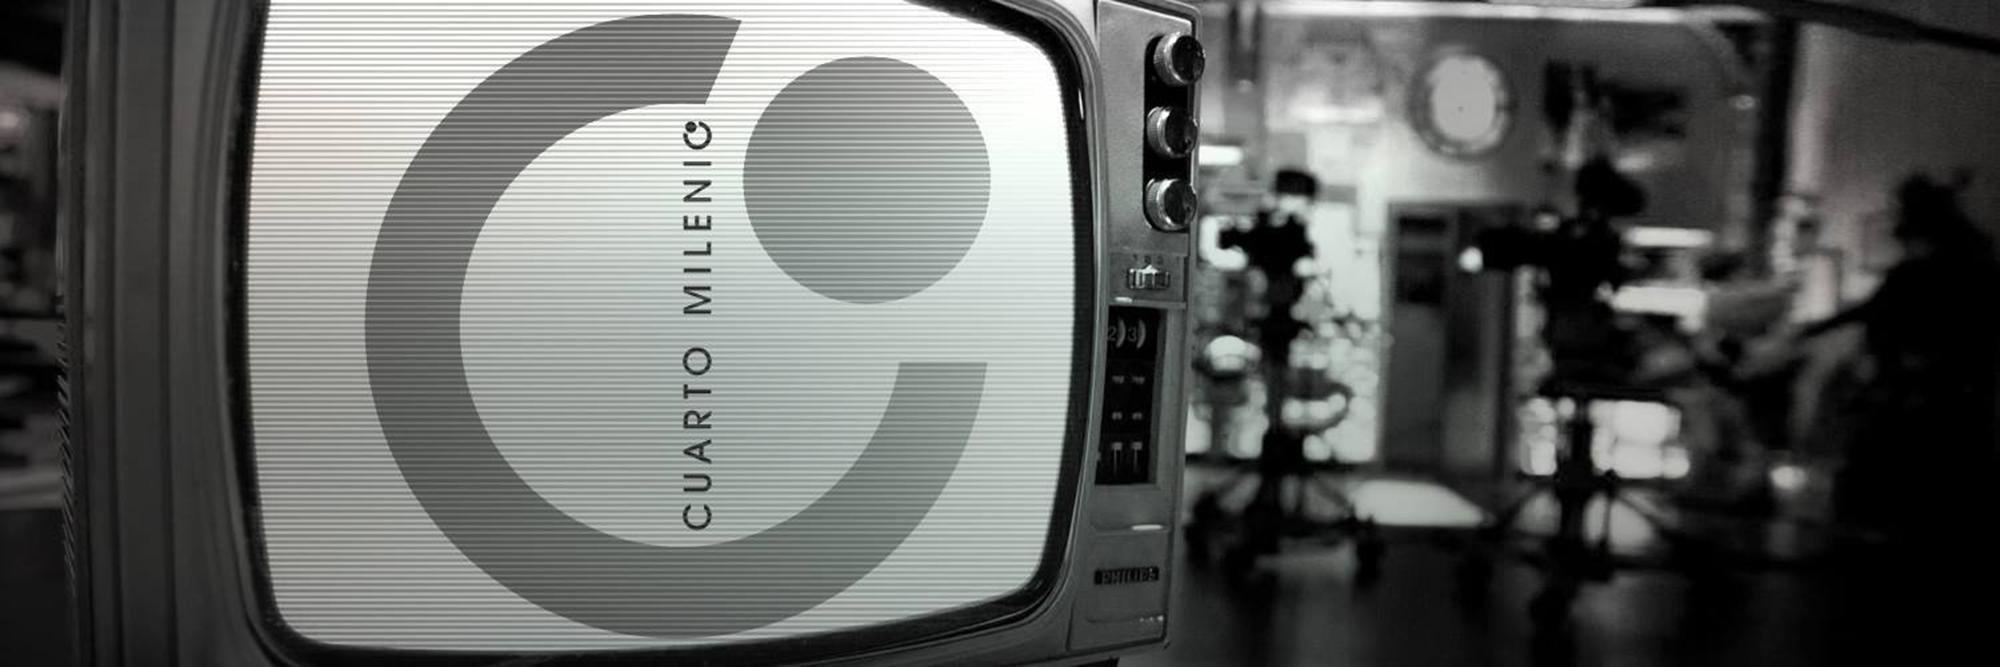 Cuarto milenio la d cima temporada de un programa at pico for Cuarto milenio videos